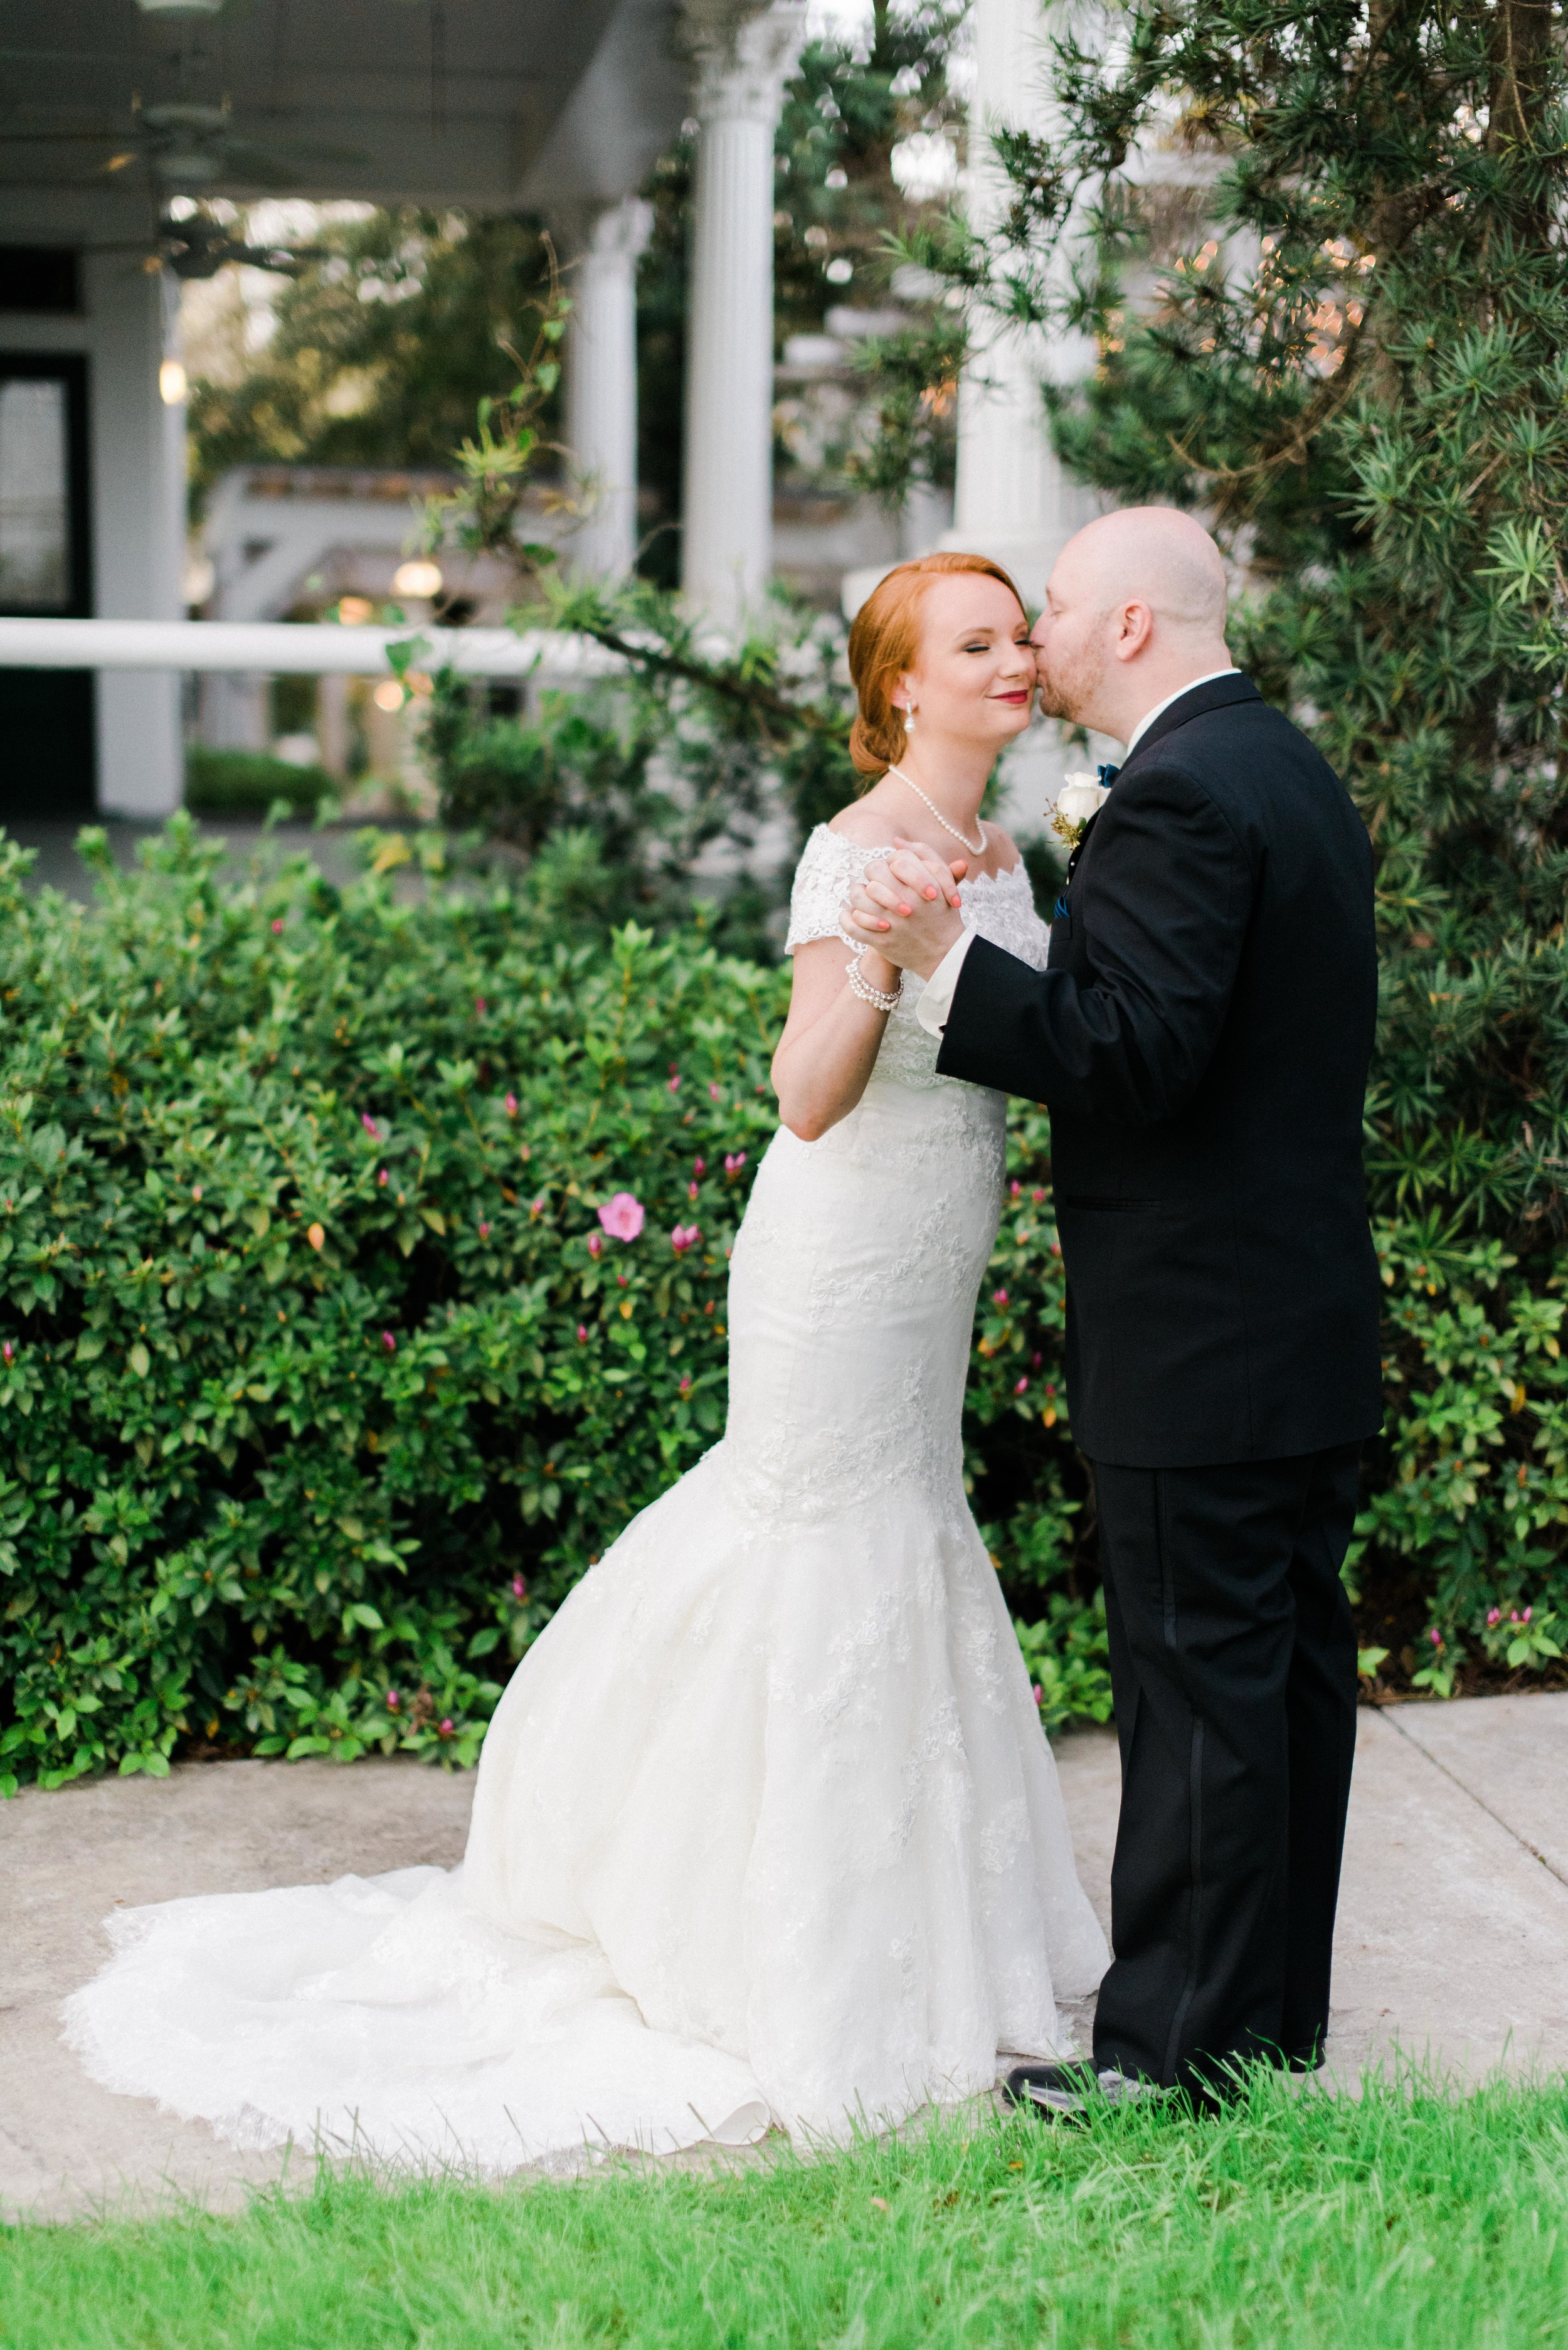 dana fernandez photography houston film wedding photographer destination heather's glen texas-21.jpg